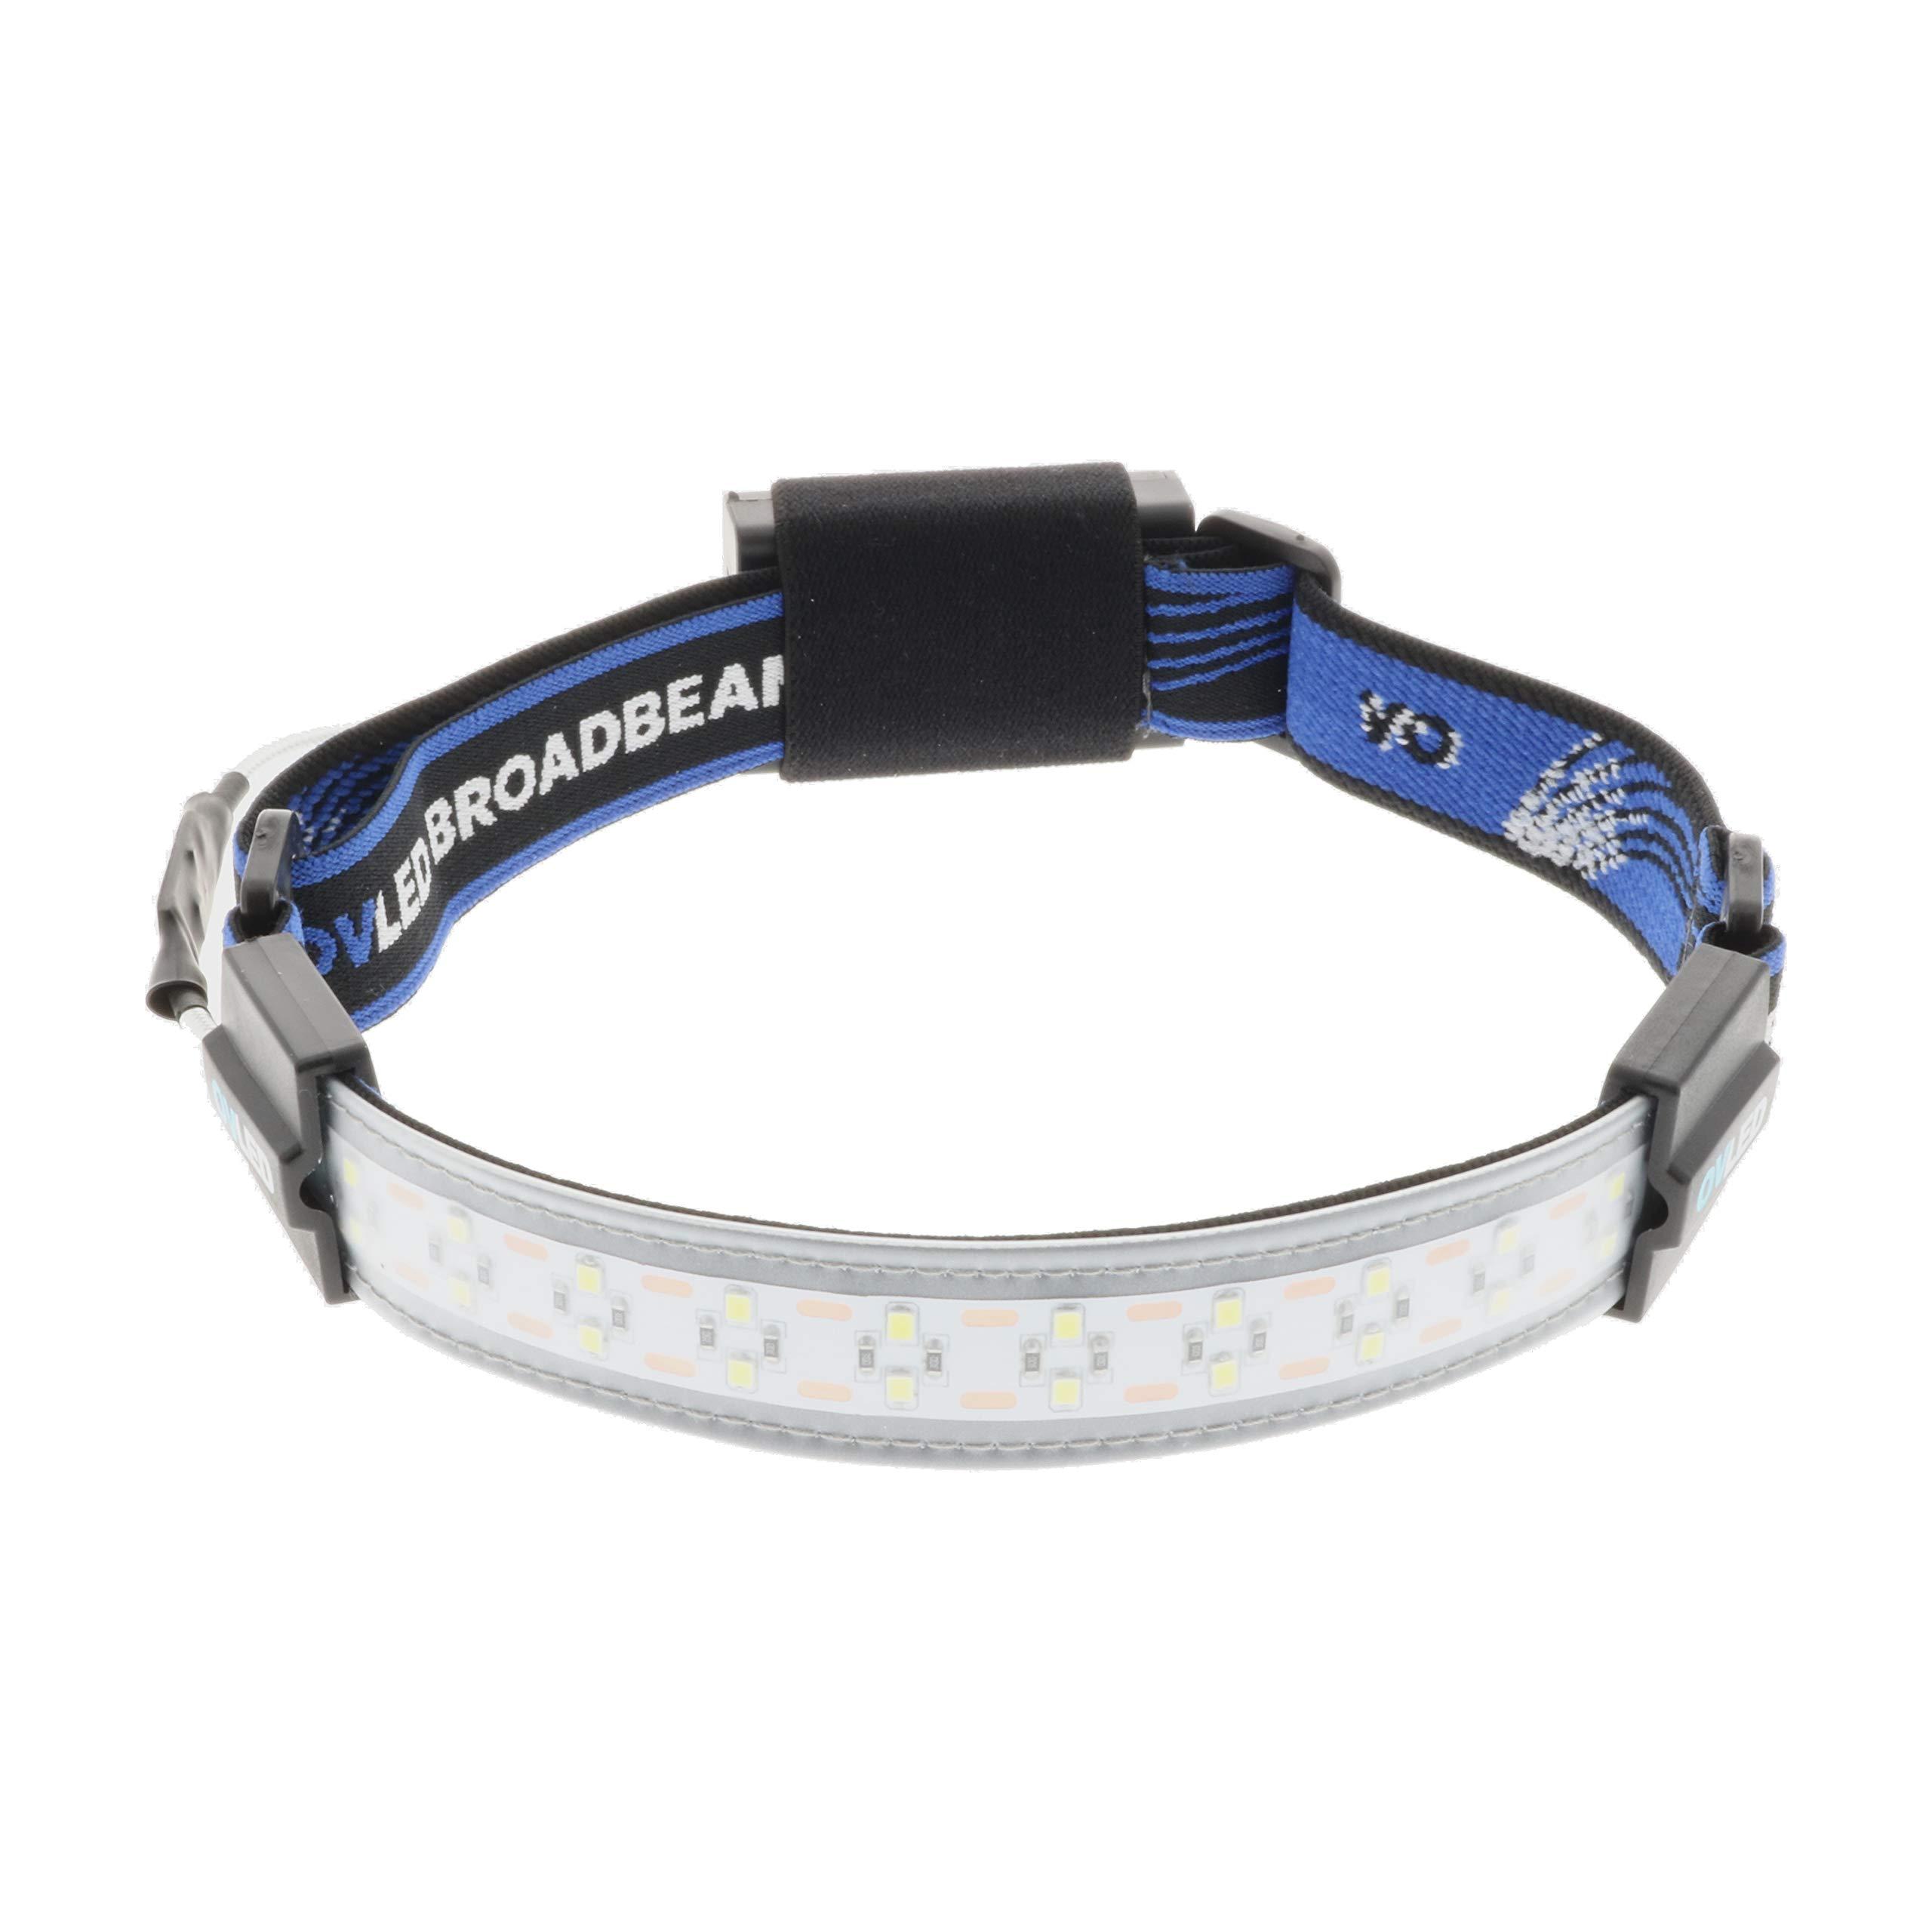 802100 Broadbeam Headlamp Ultra Low Illumination